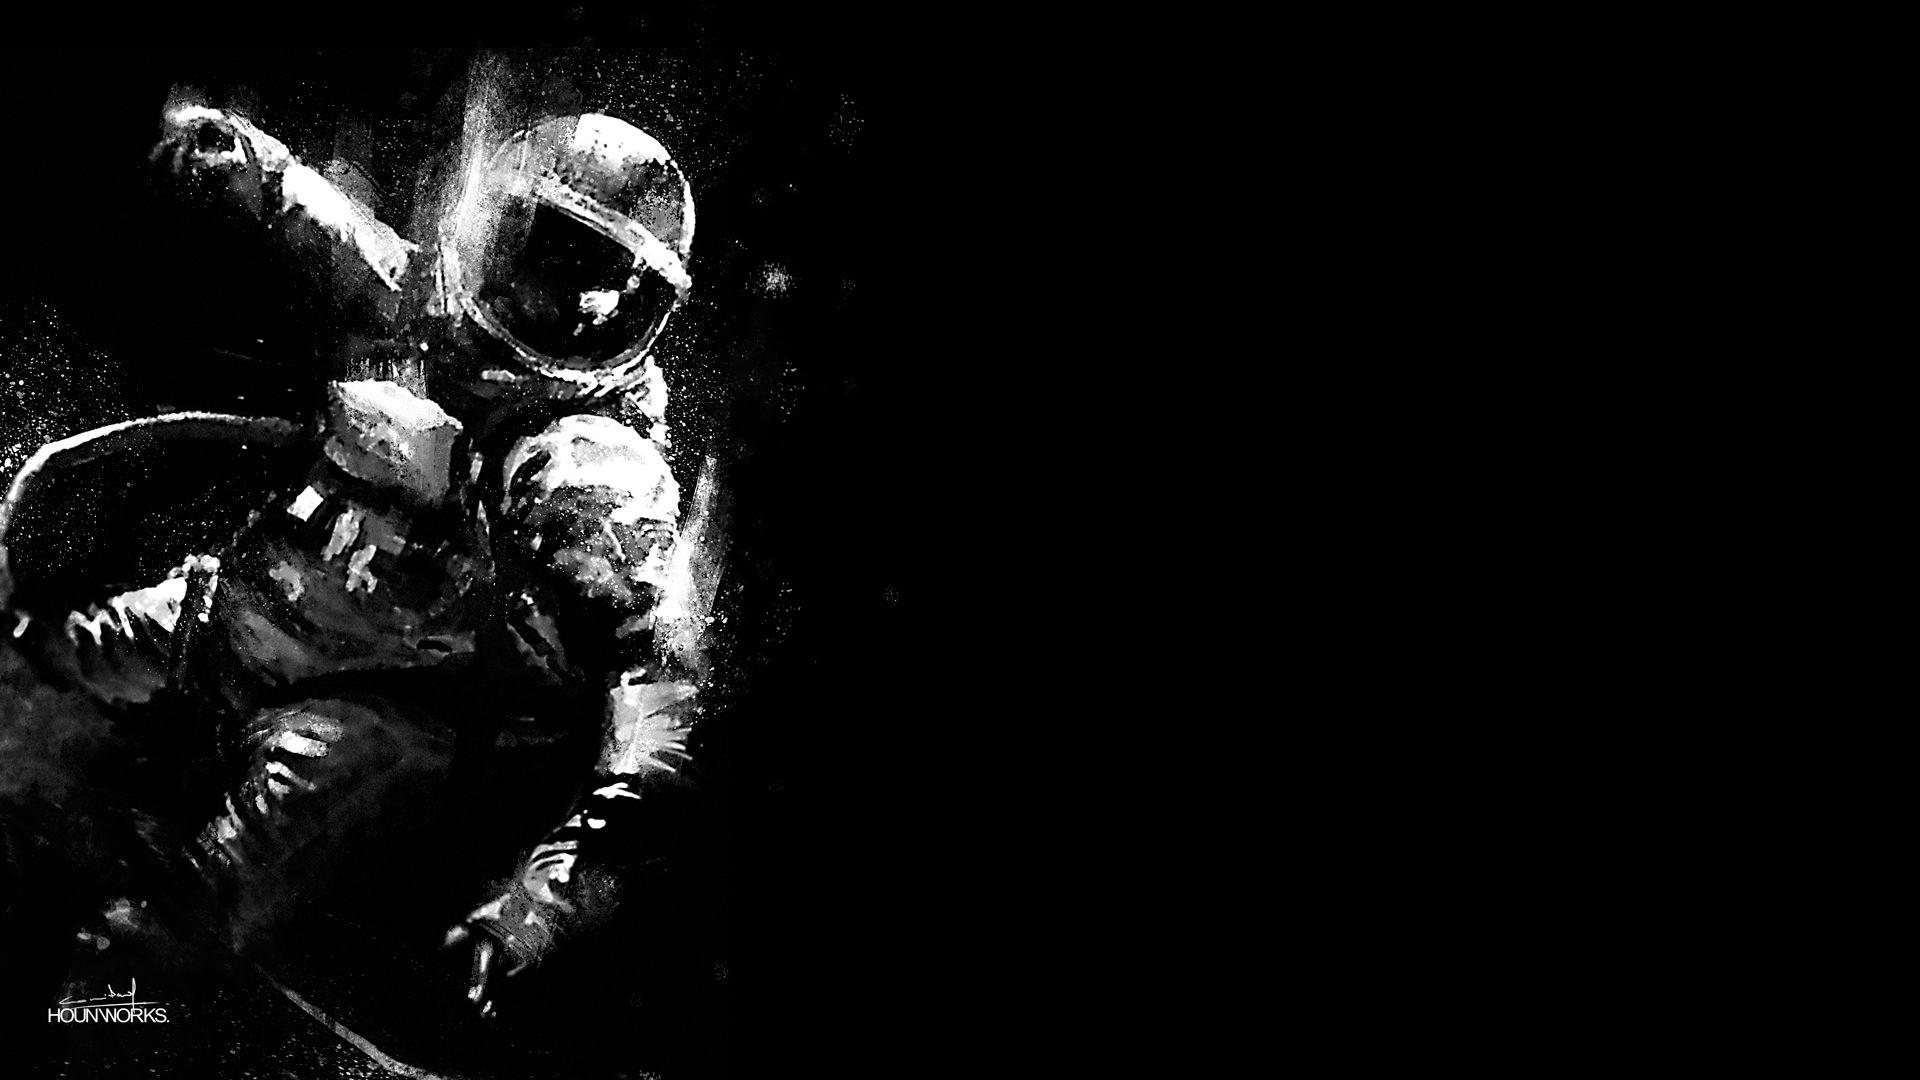 Drawn wallpaper astronaut Astronaut Wallpapers Free Wallpapers Desktop